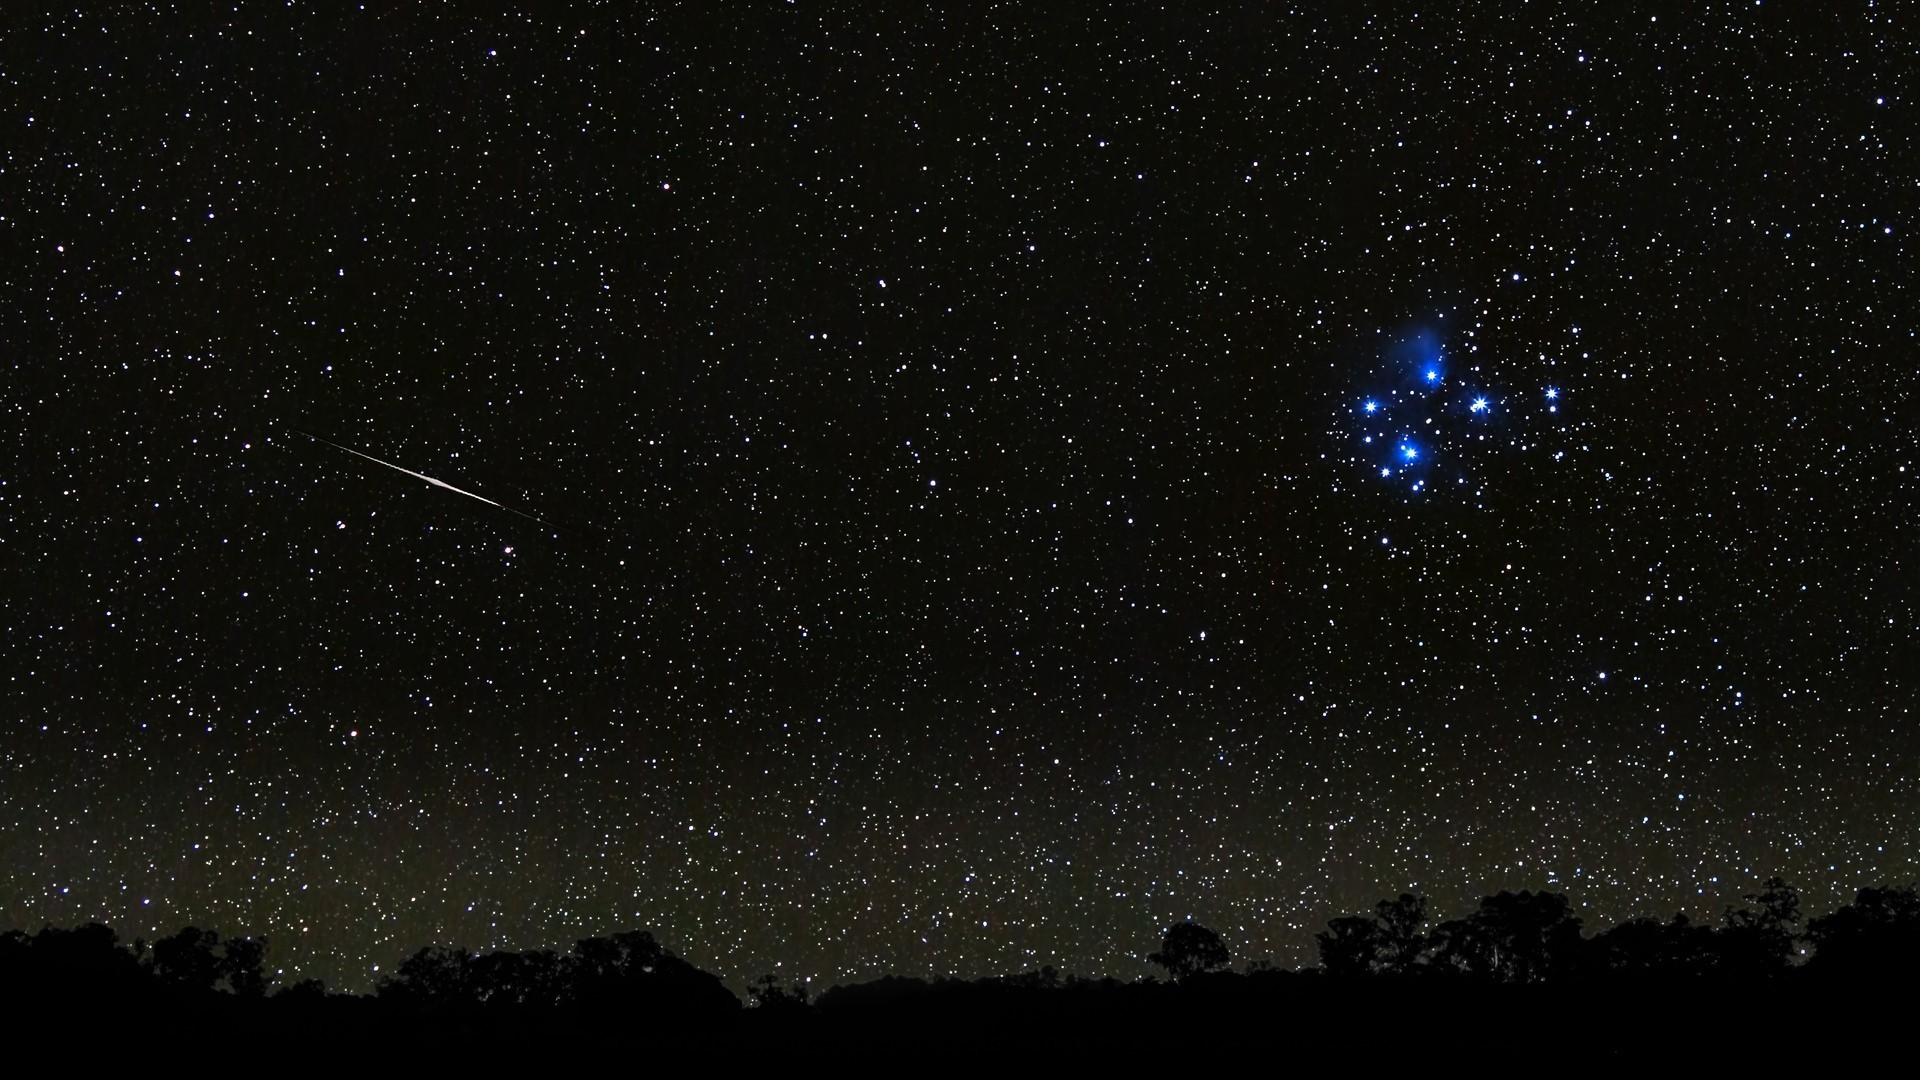 Space stars night. 1920×1080. Fantastic Space Wallpaper 45452